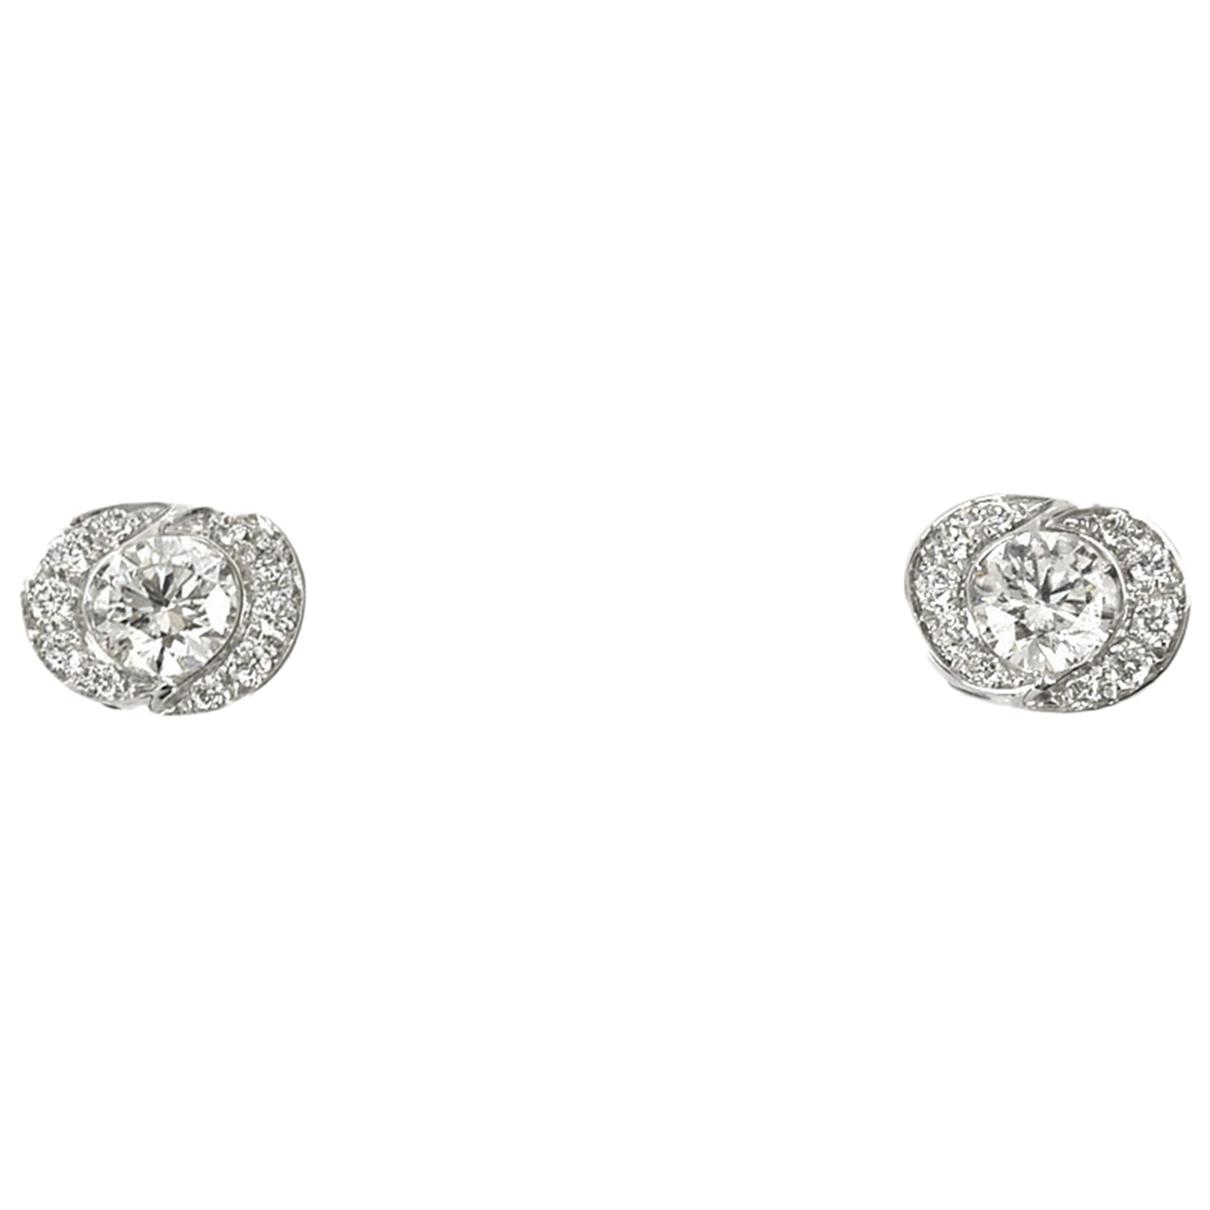 Bvlgari \N Silver White gold Earrings for Women \N